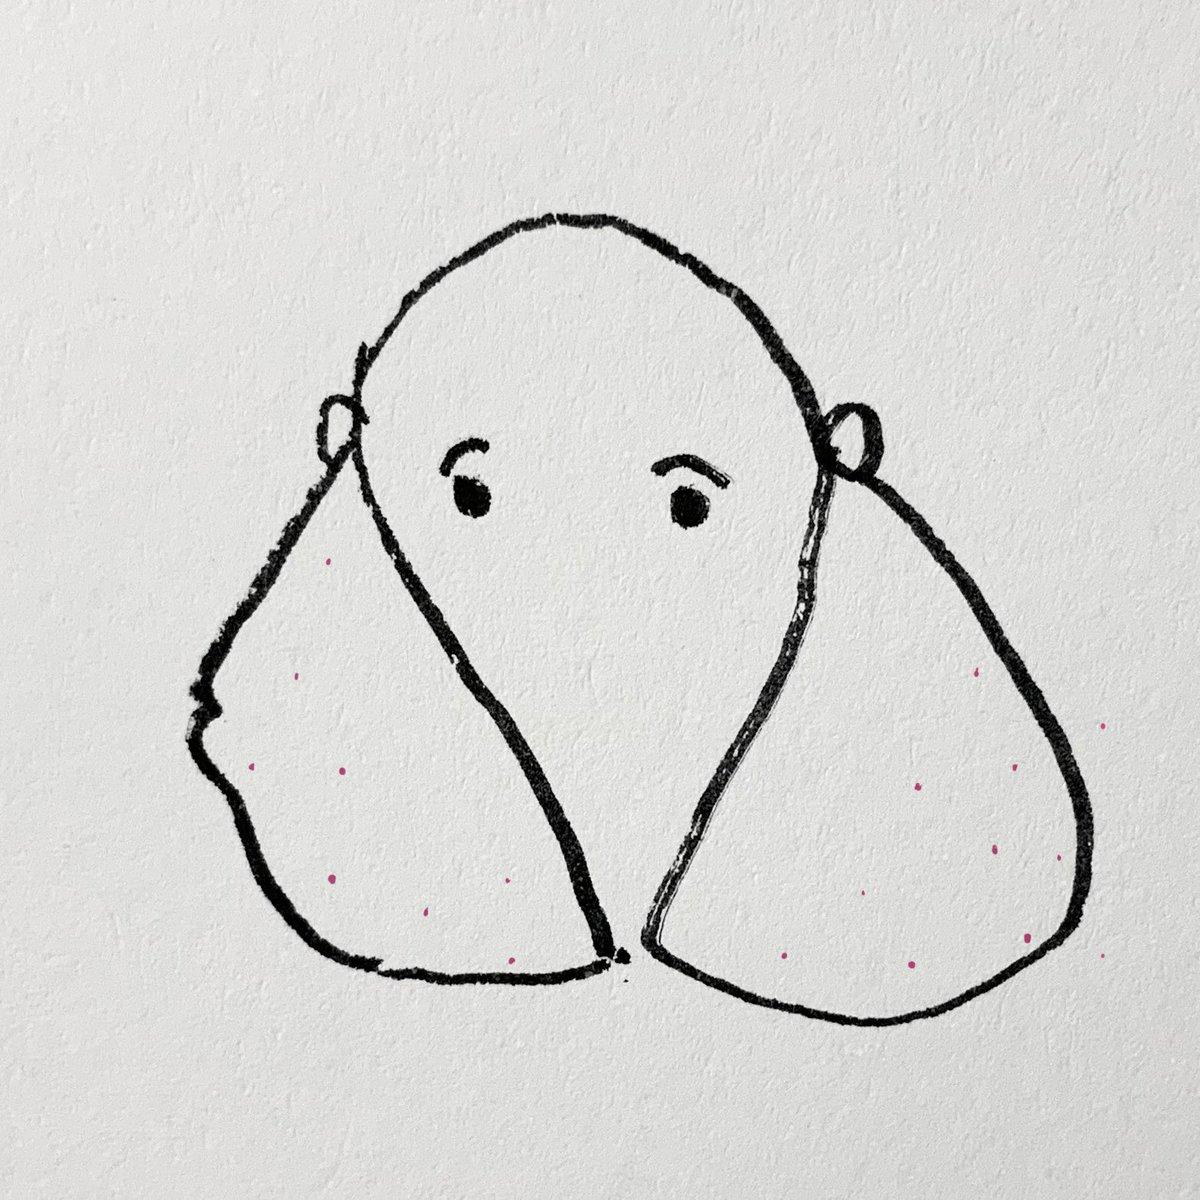 #spät #late #LateNightAlter #LateNight #LateLateShow #spätnachts #SaturdayNight #Saturday #latenightdrawing #drawing #minimalistlogo #minimalism